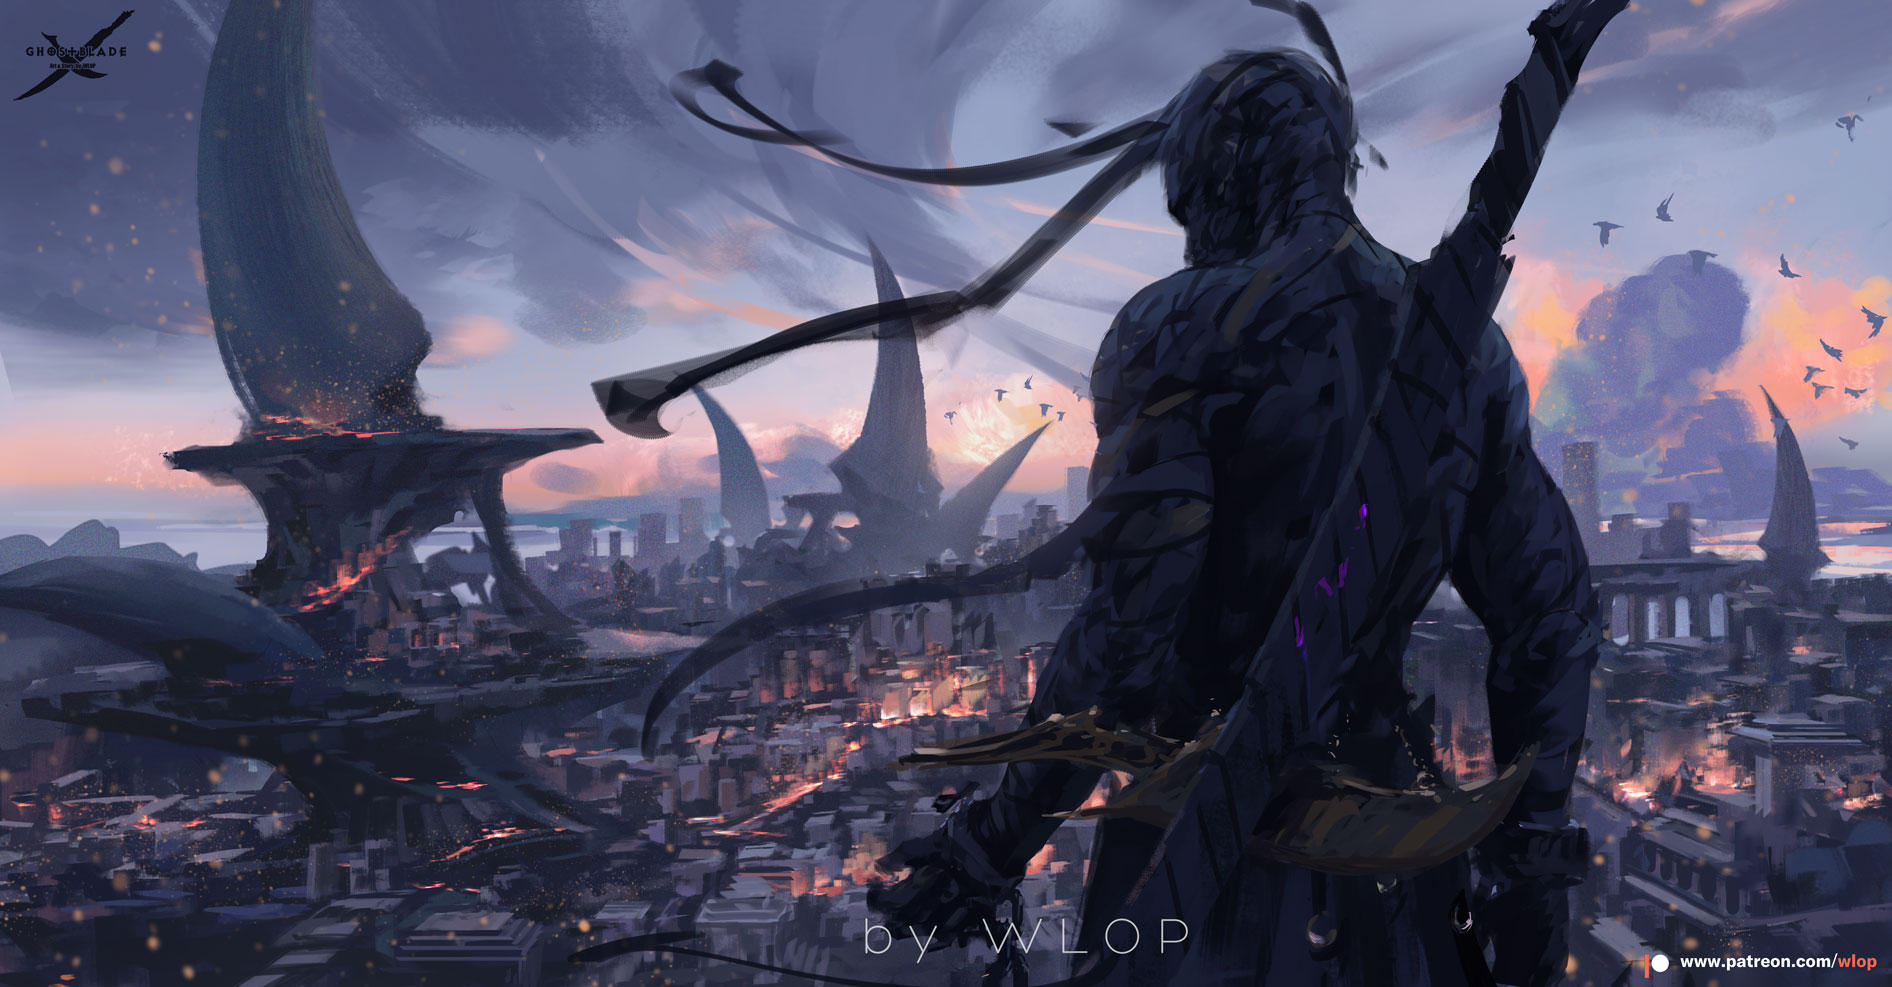 Ghostblade by wlop